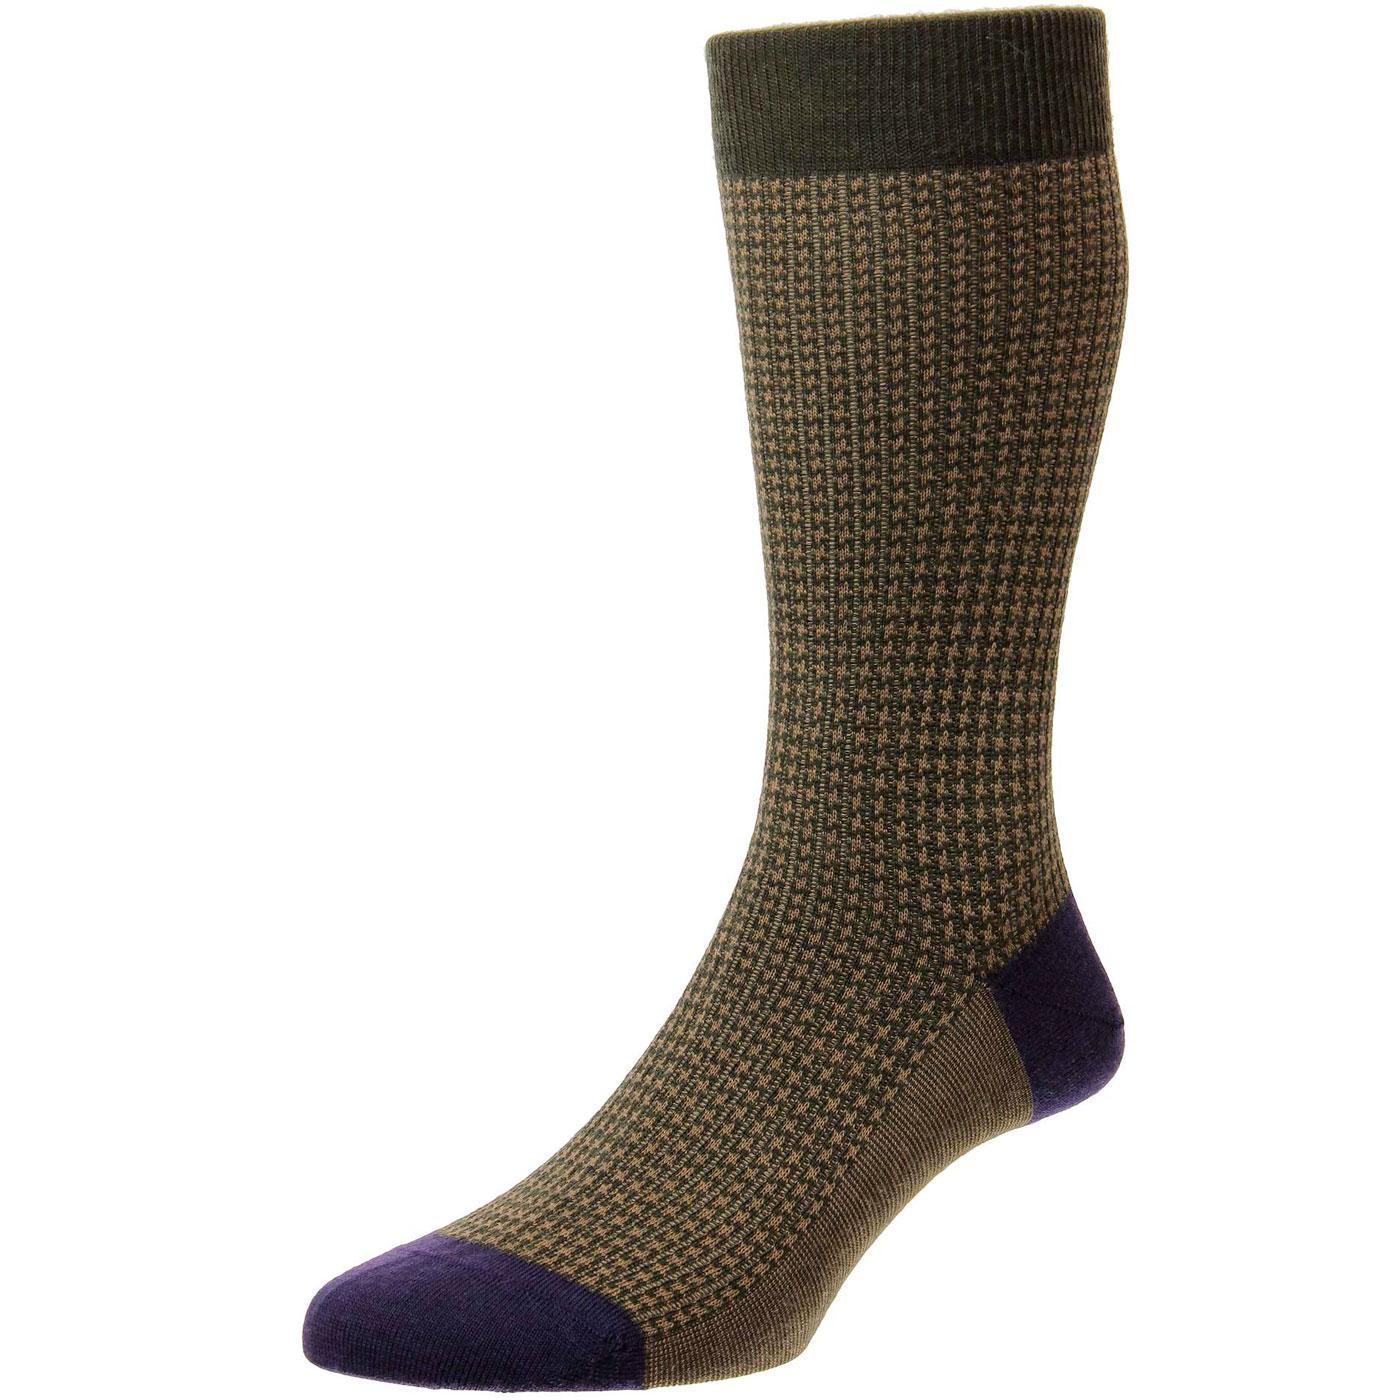 + Hatherley PANTHERELLA Houndstooth Socks (Olive)